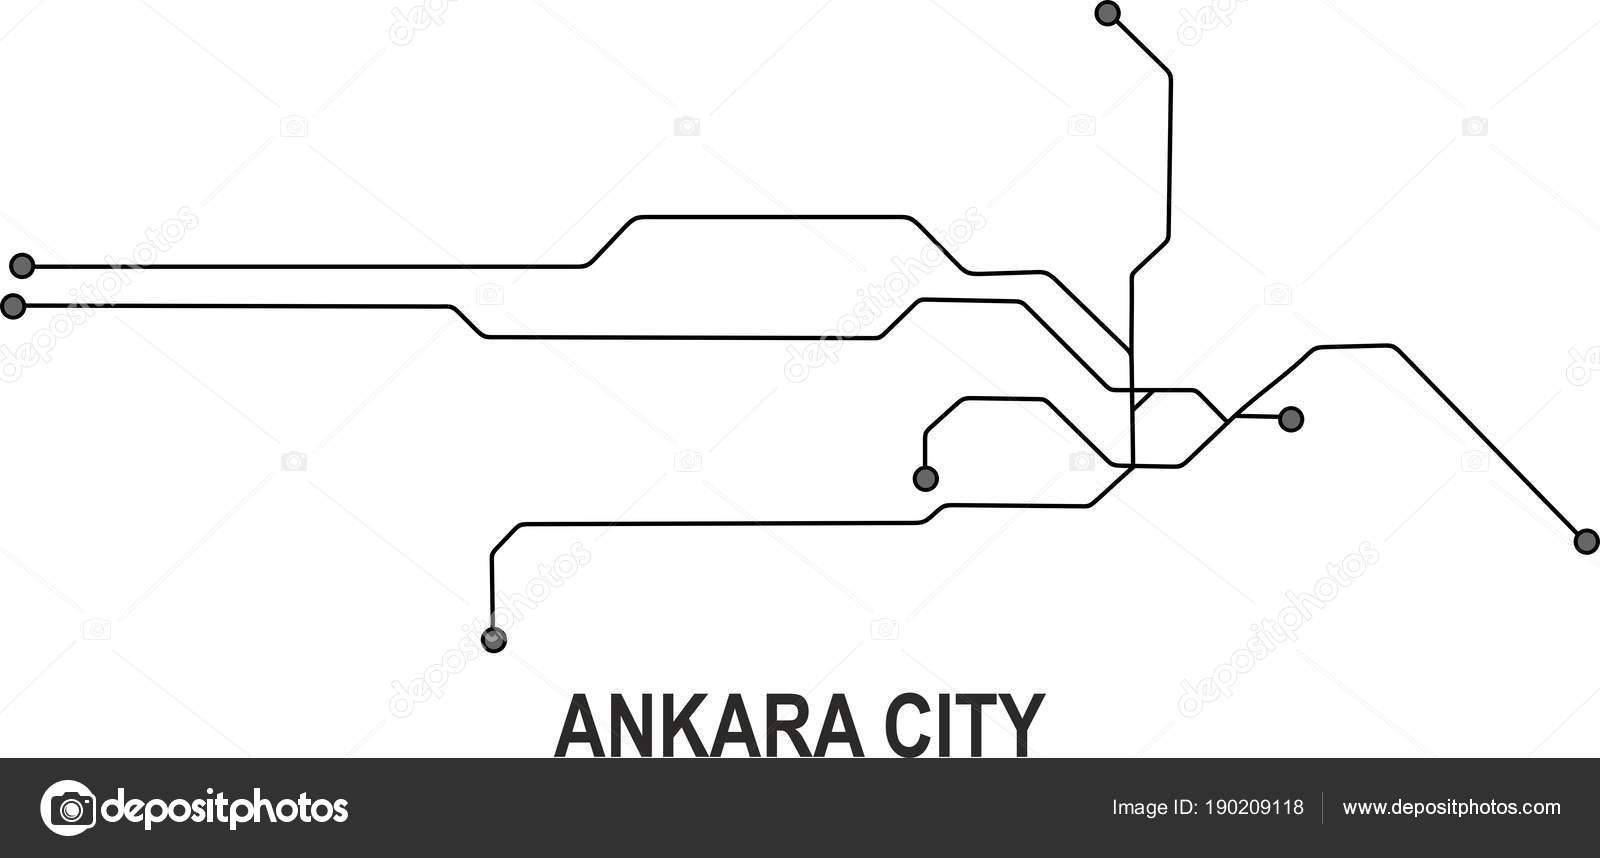 Ankara Subway Map Vector File Format Stock Vector C Fishvector